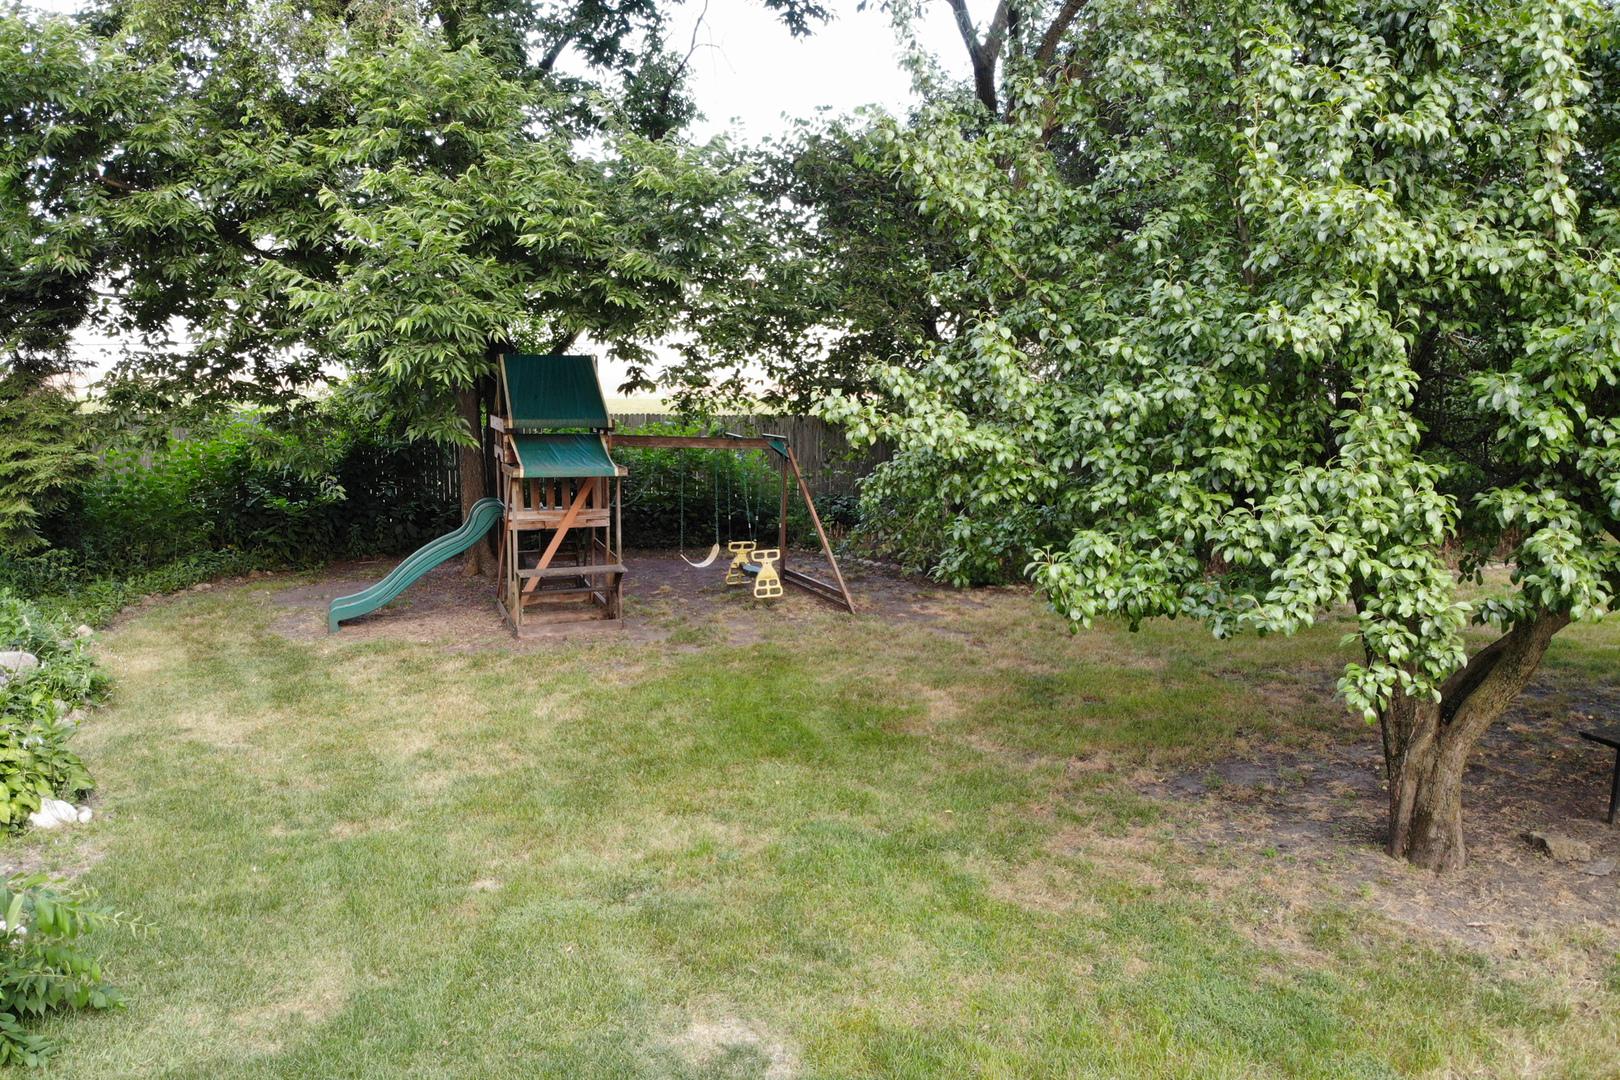 8101 Amber, Machesney Park, Illinois, 61115